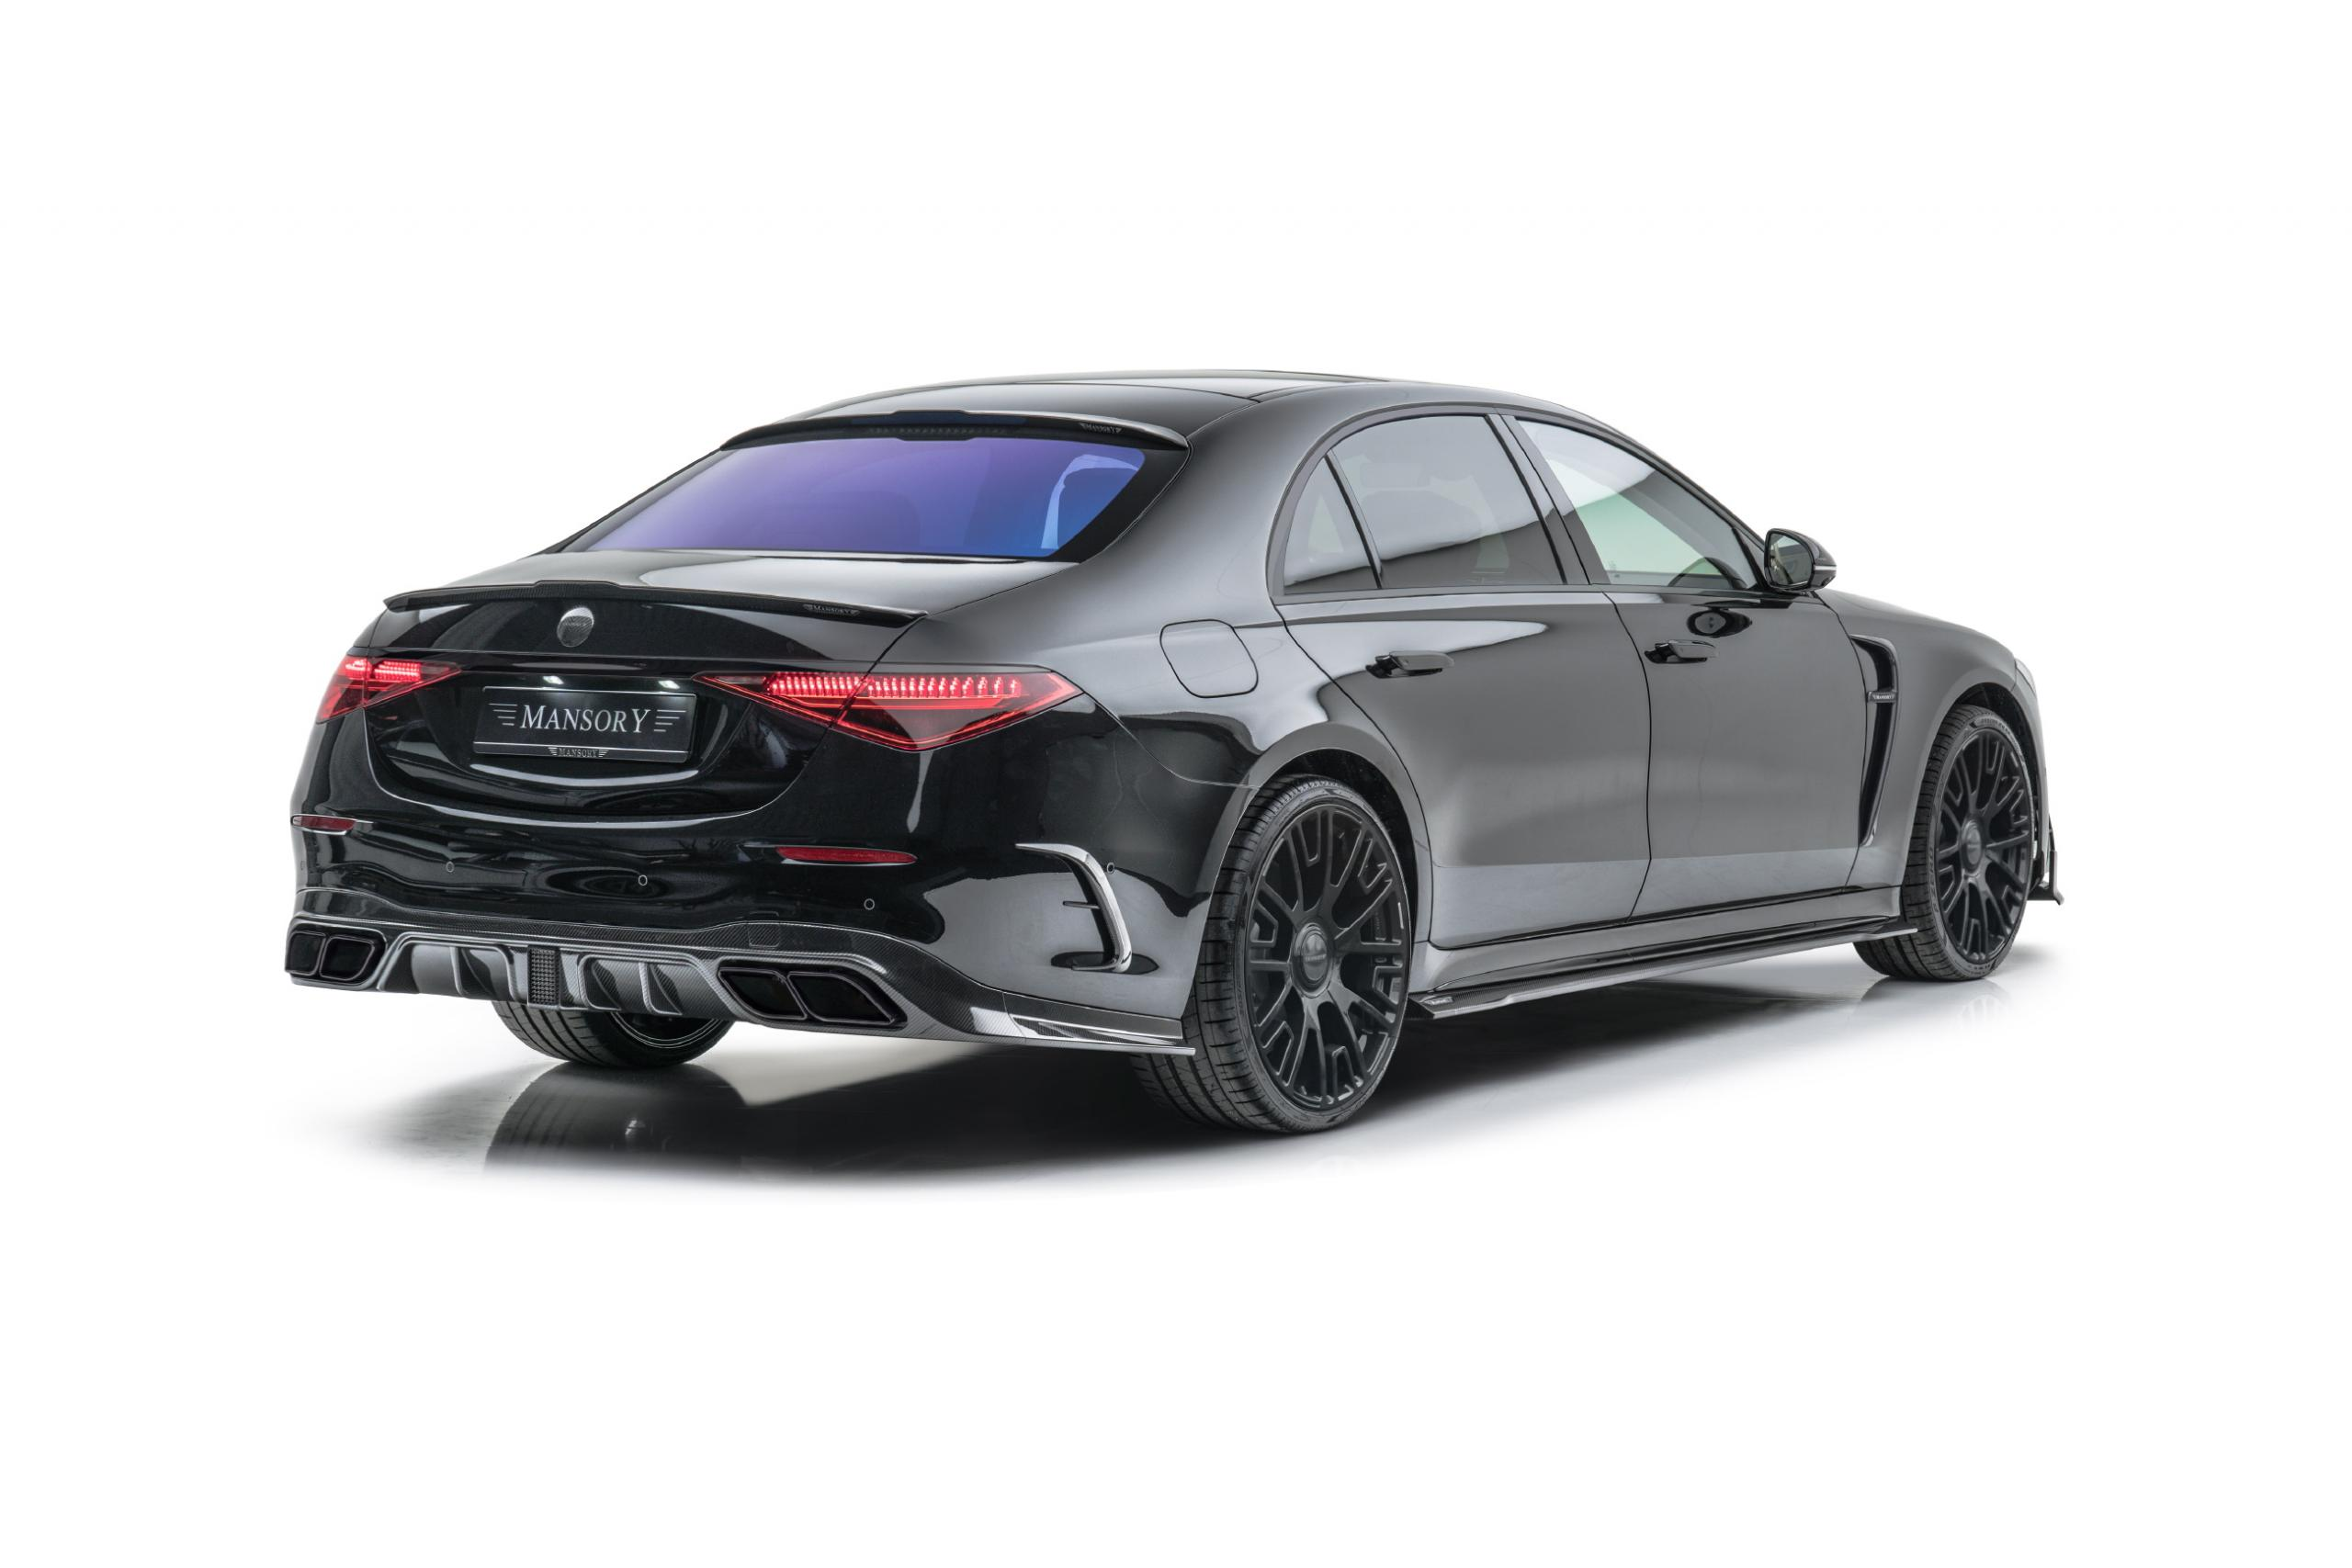 mansory w223 mercedes s class body kit carbon fiber rear apron trunk spoiler rear bumper air outtake roof spoiler gloss black v6 22 wheel 2021 2022 2023